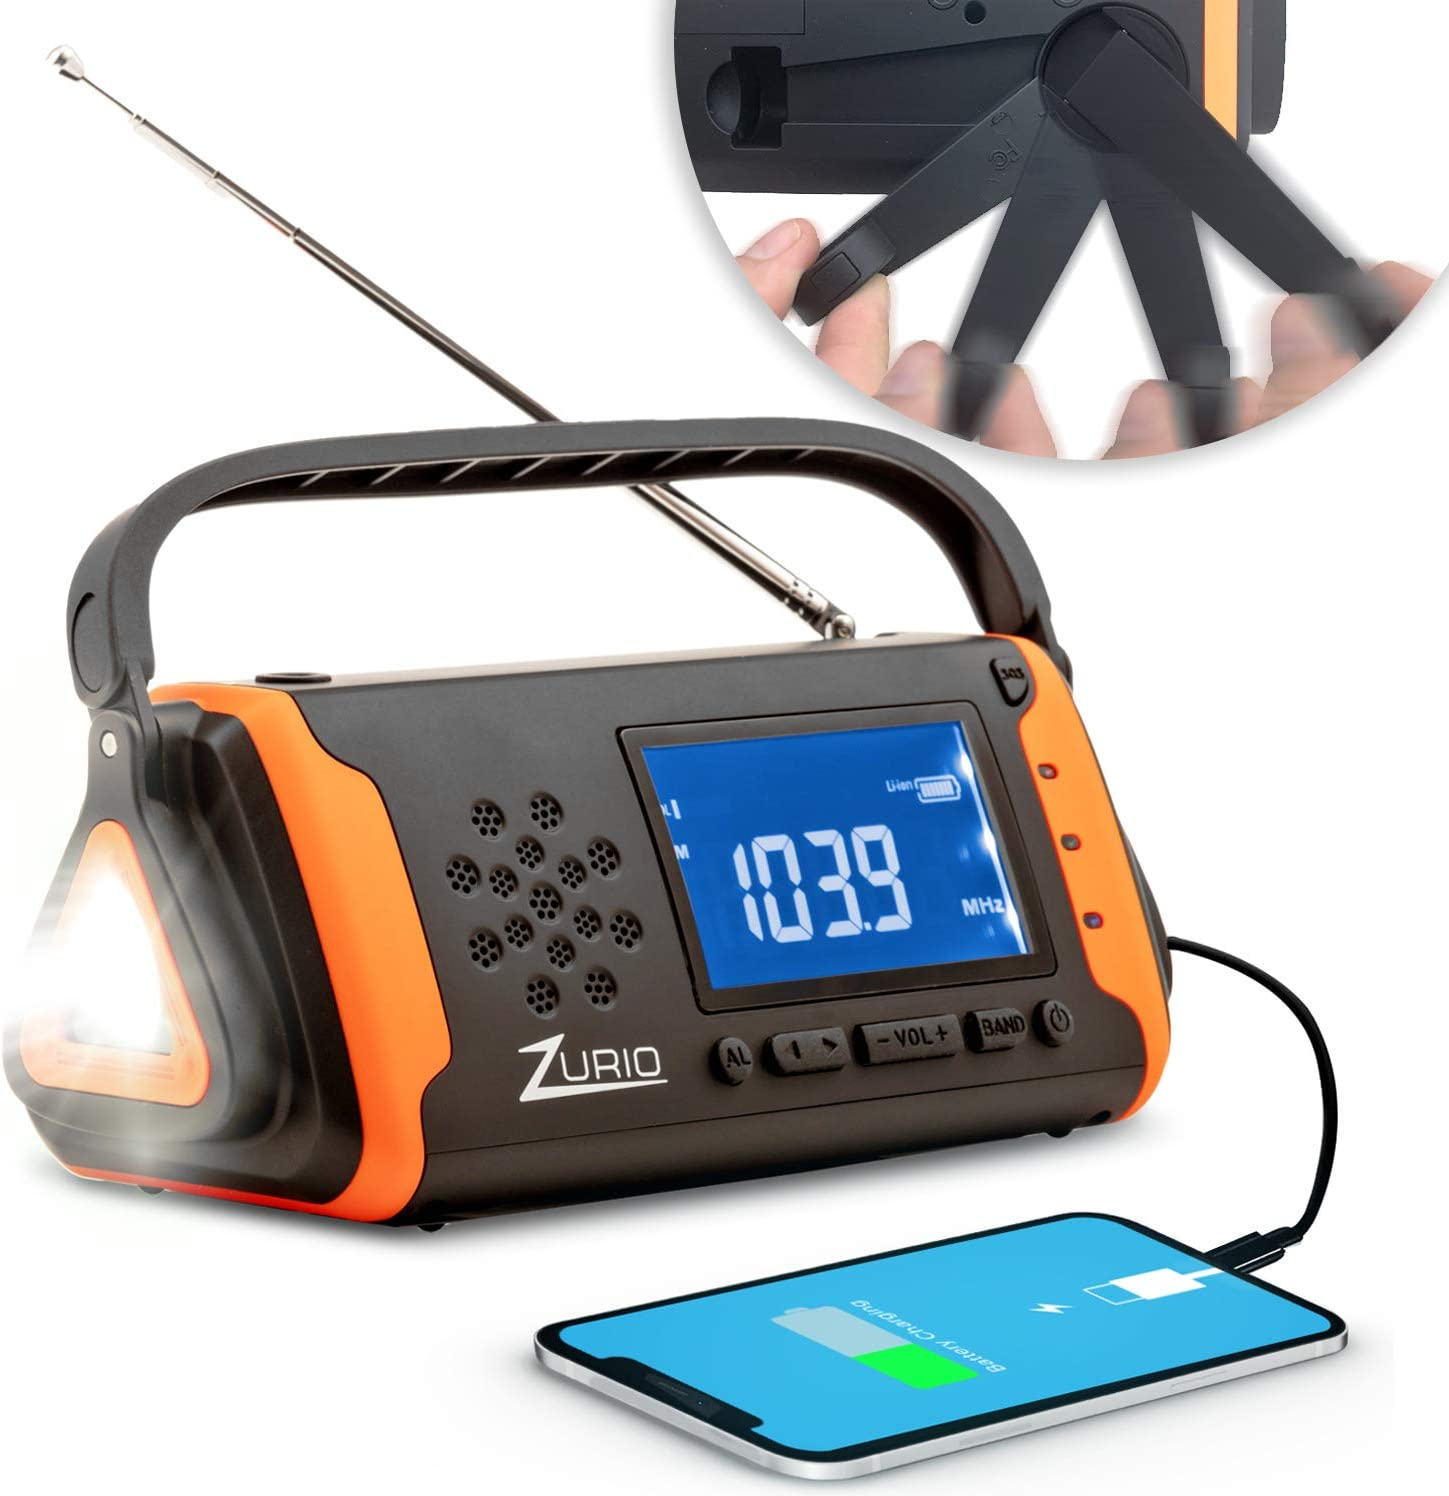 Emergency Radio with NOAA Weather Alert - Hand Crank & Solar Powered Hurricane Radio – AM FM Weather Survival Radio with Battery Backup, Flashlight, Phone Charger, SOS Alarm, & Bonus Survival Whistle